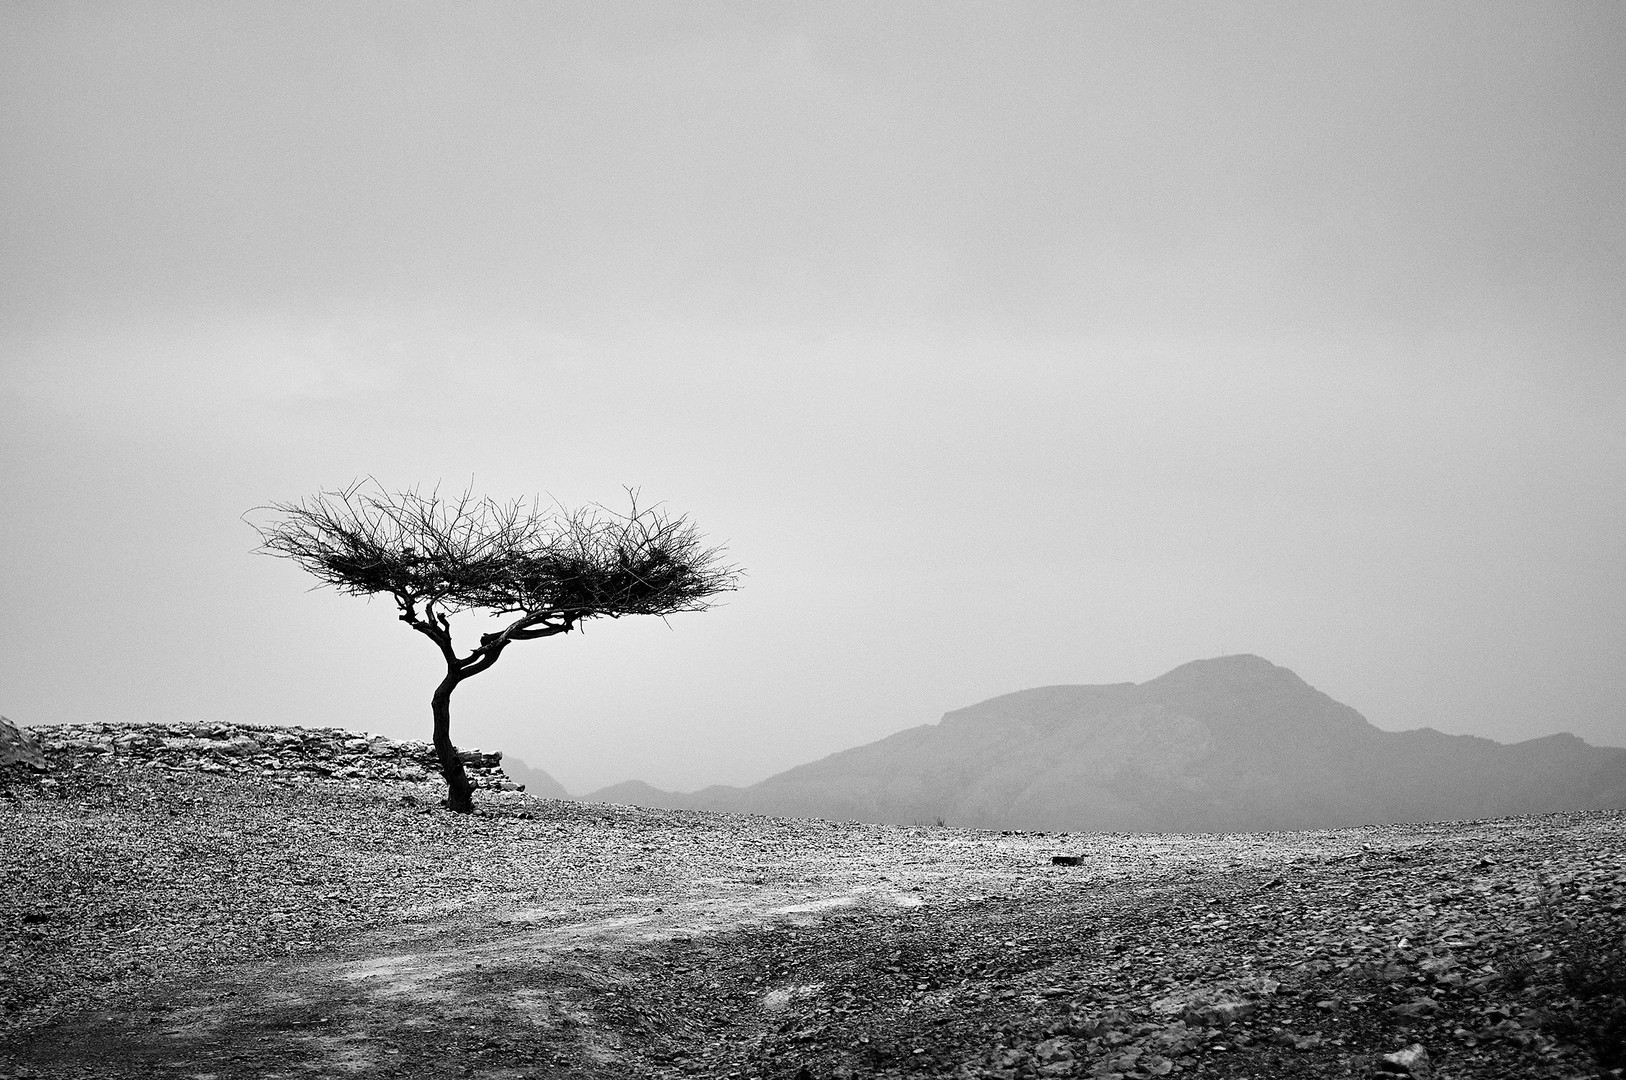 View in Musandam, Oman